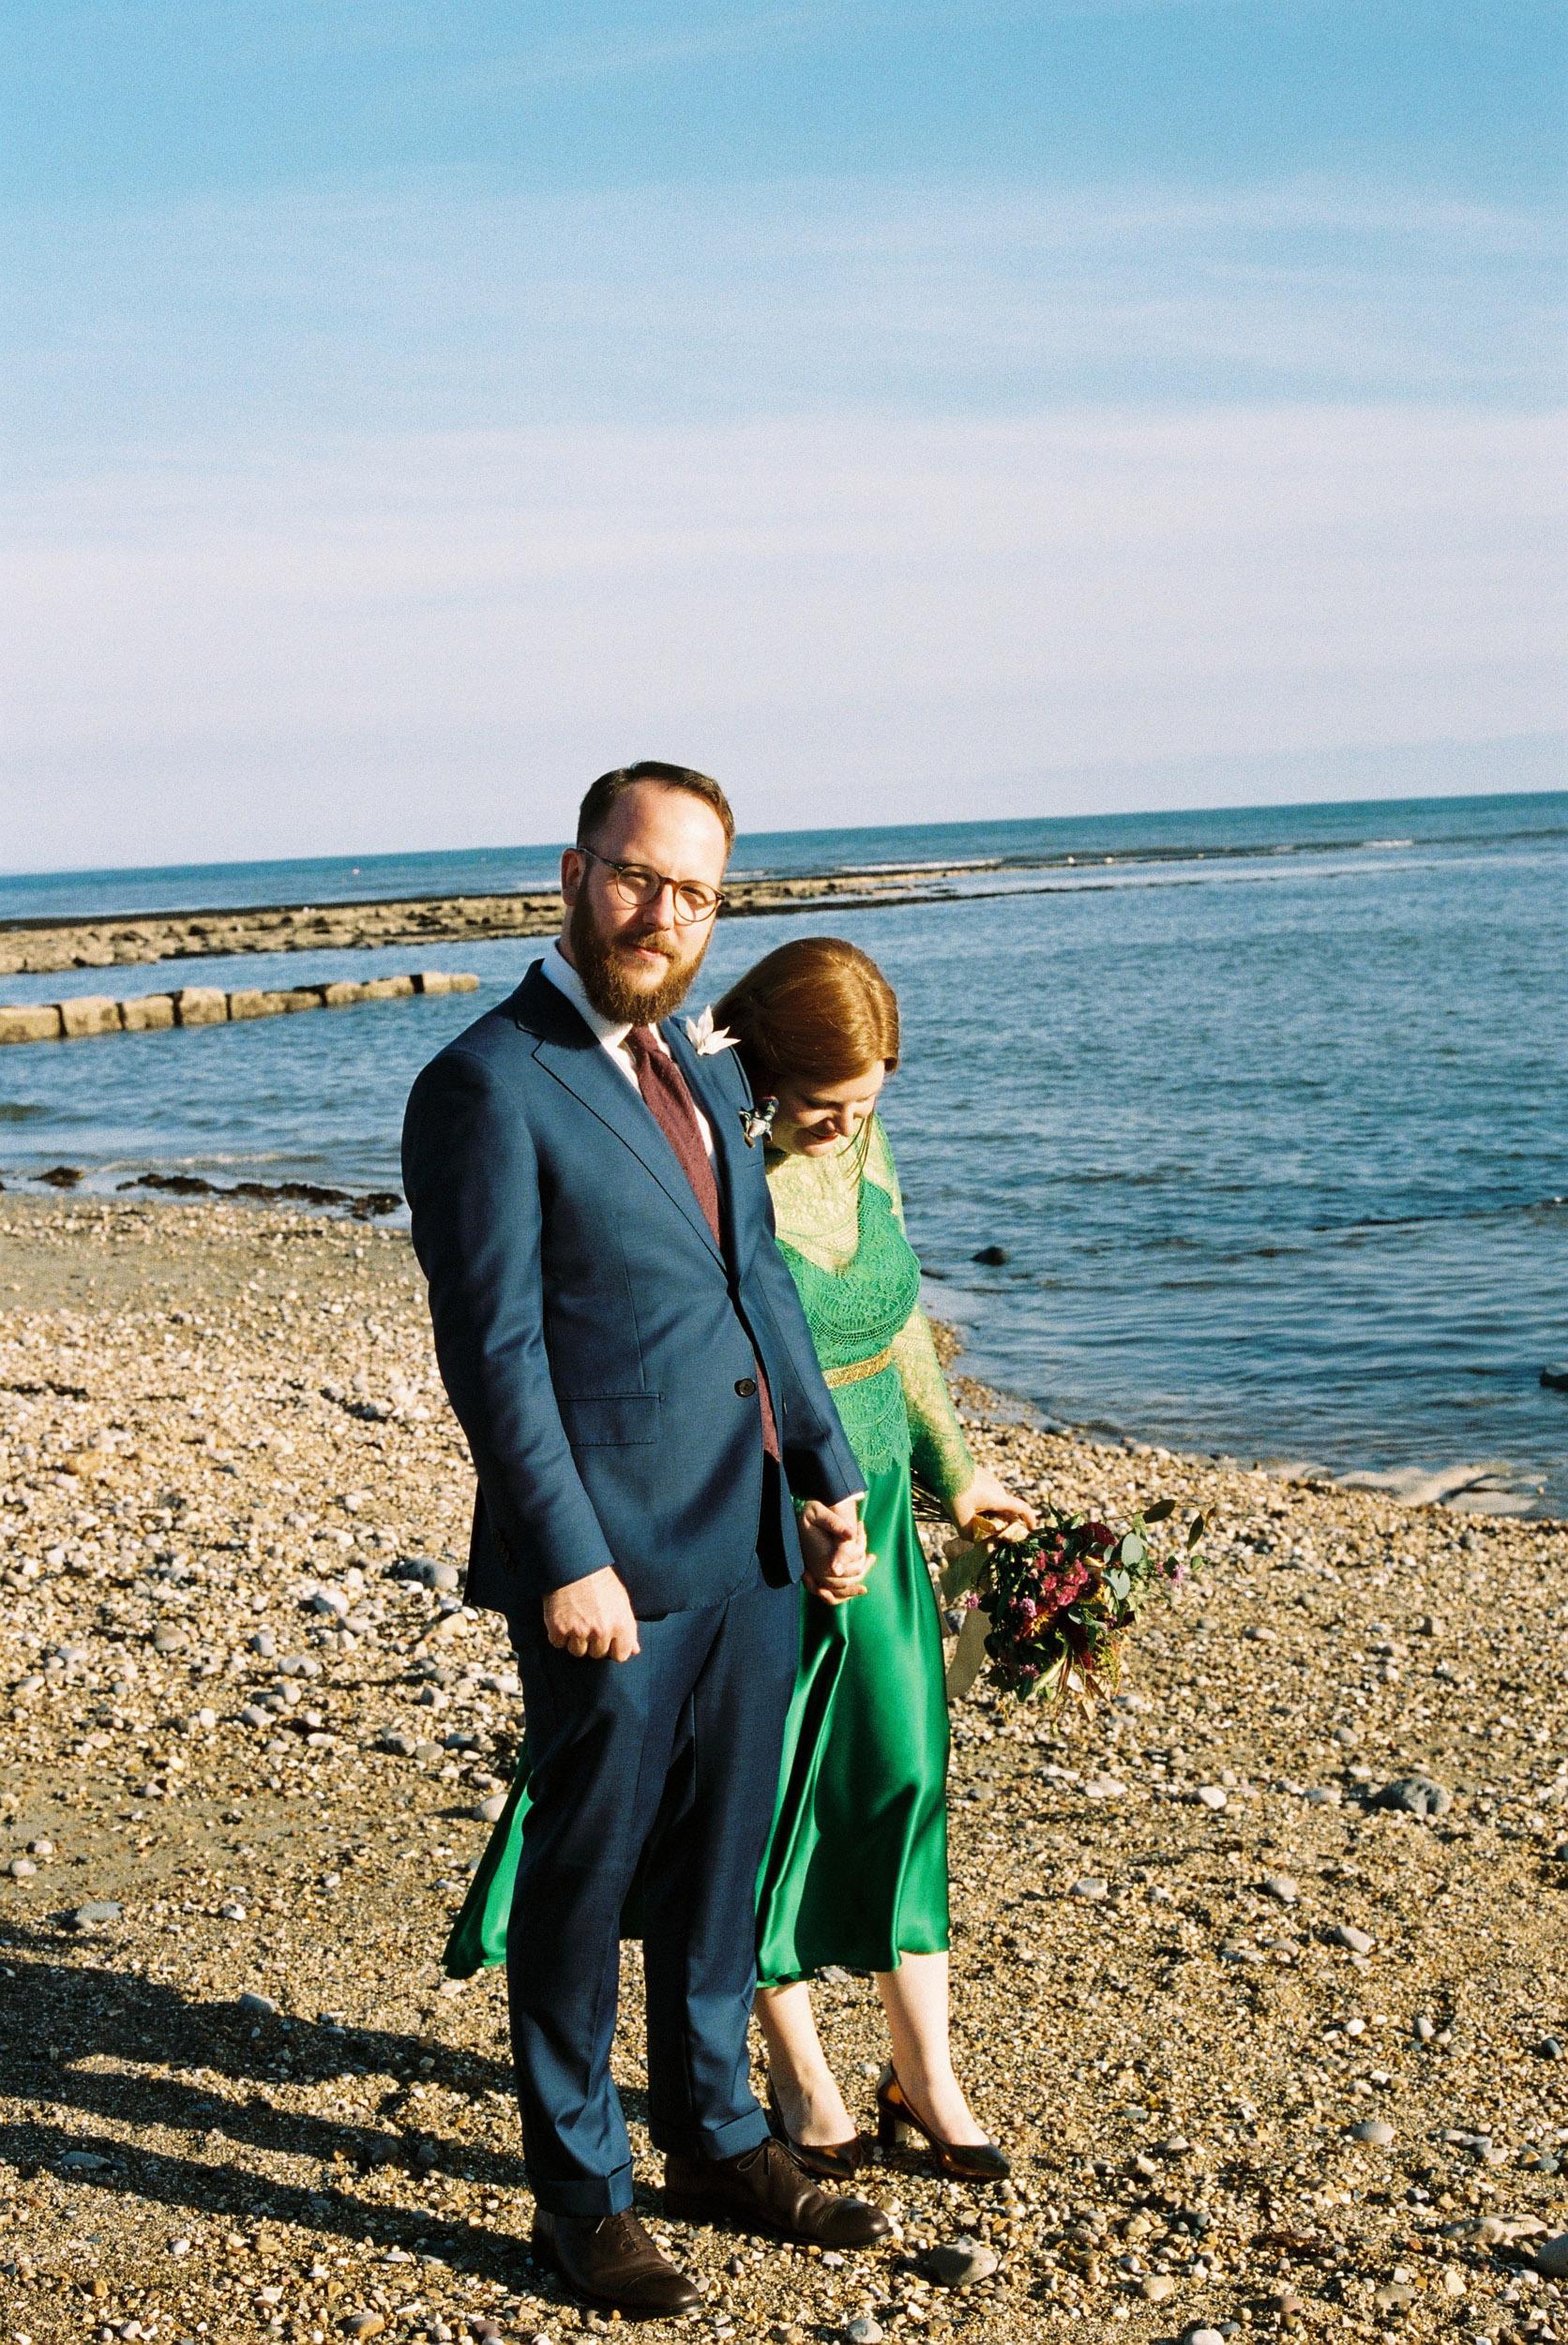 Lucy-Bespoke-Green-Silk-Lace-Wedding-Dress-Kate-Beaumont-Sheffield-20.jpg